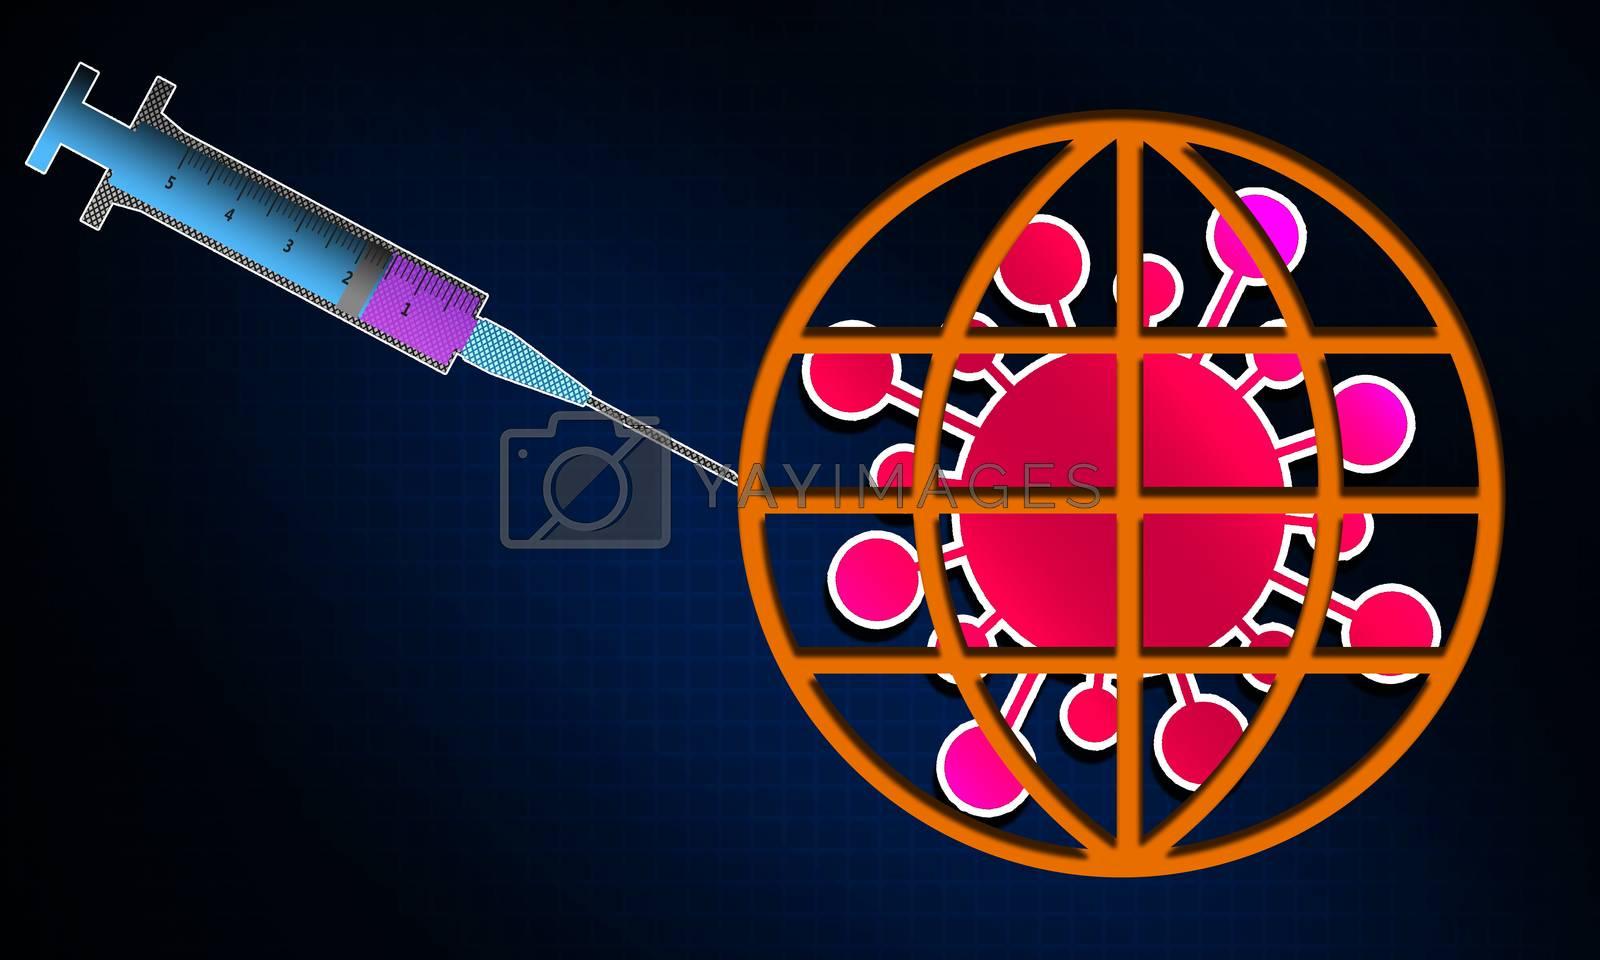 Syringe and virus on globe symbol. 3D rendering